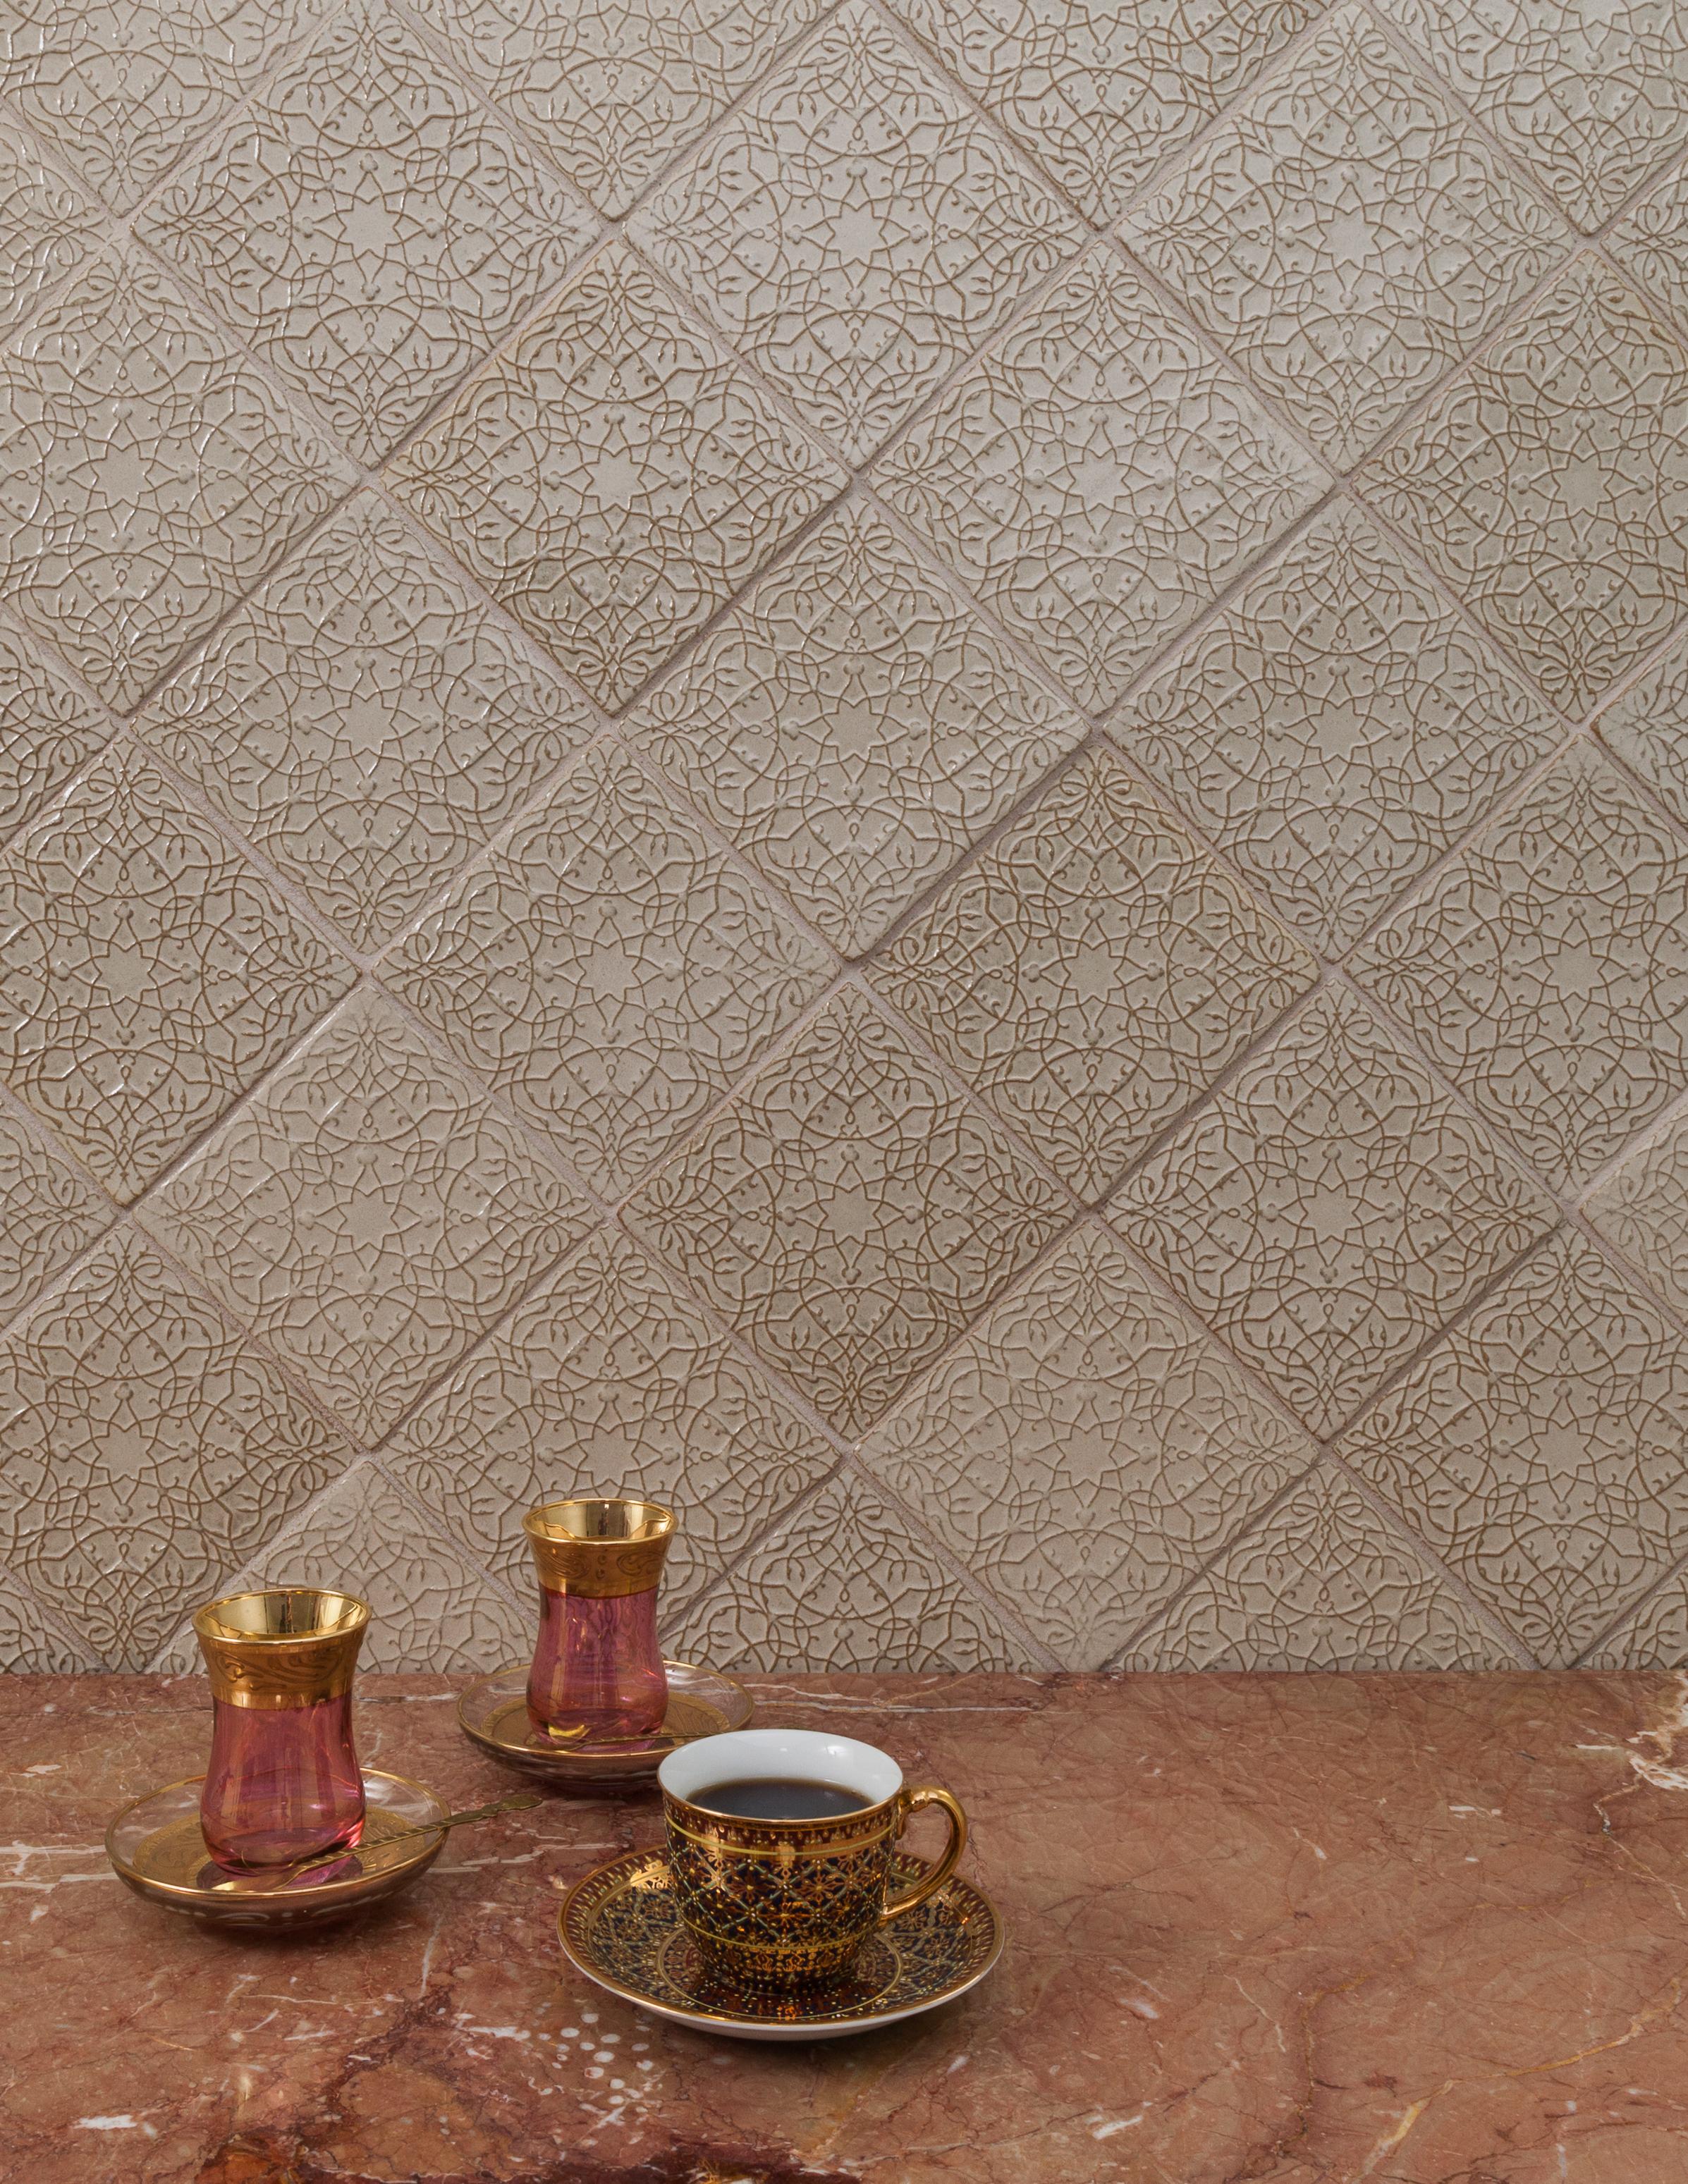 Tangier textured field, Marrakesh Collection, Lilywork Artisan Tile.jpg